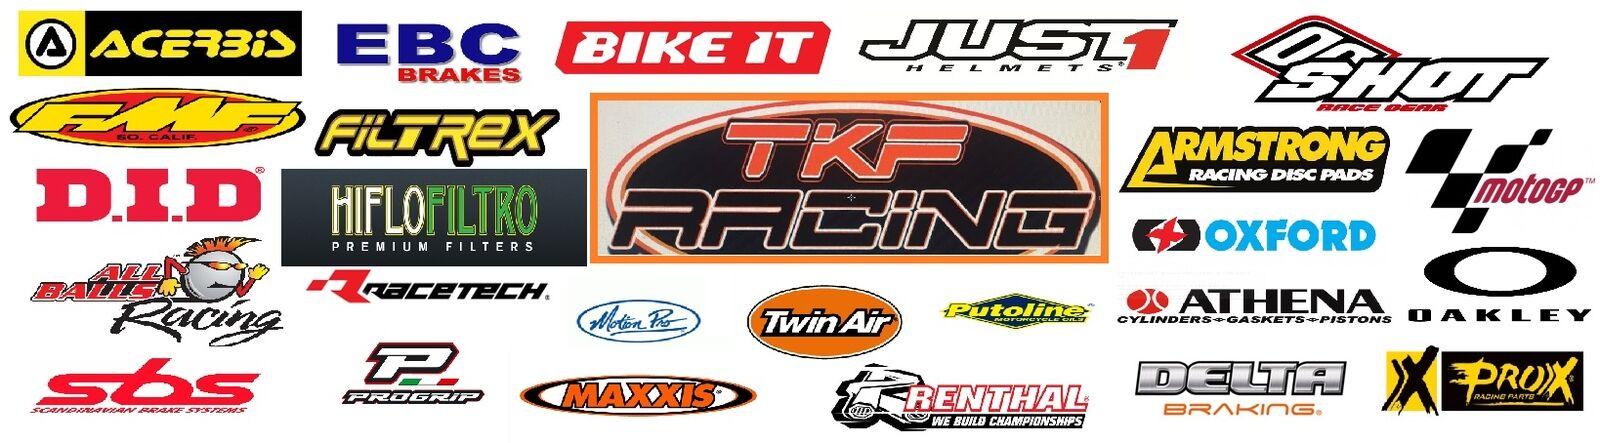 TKF-RACING